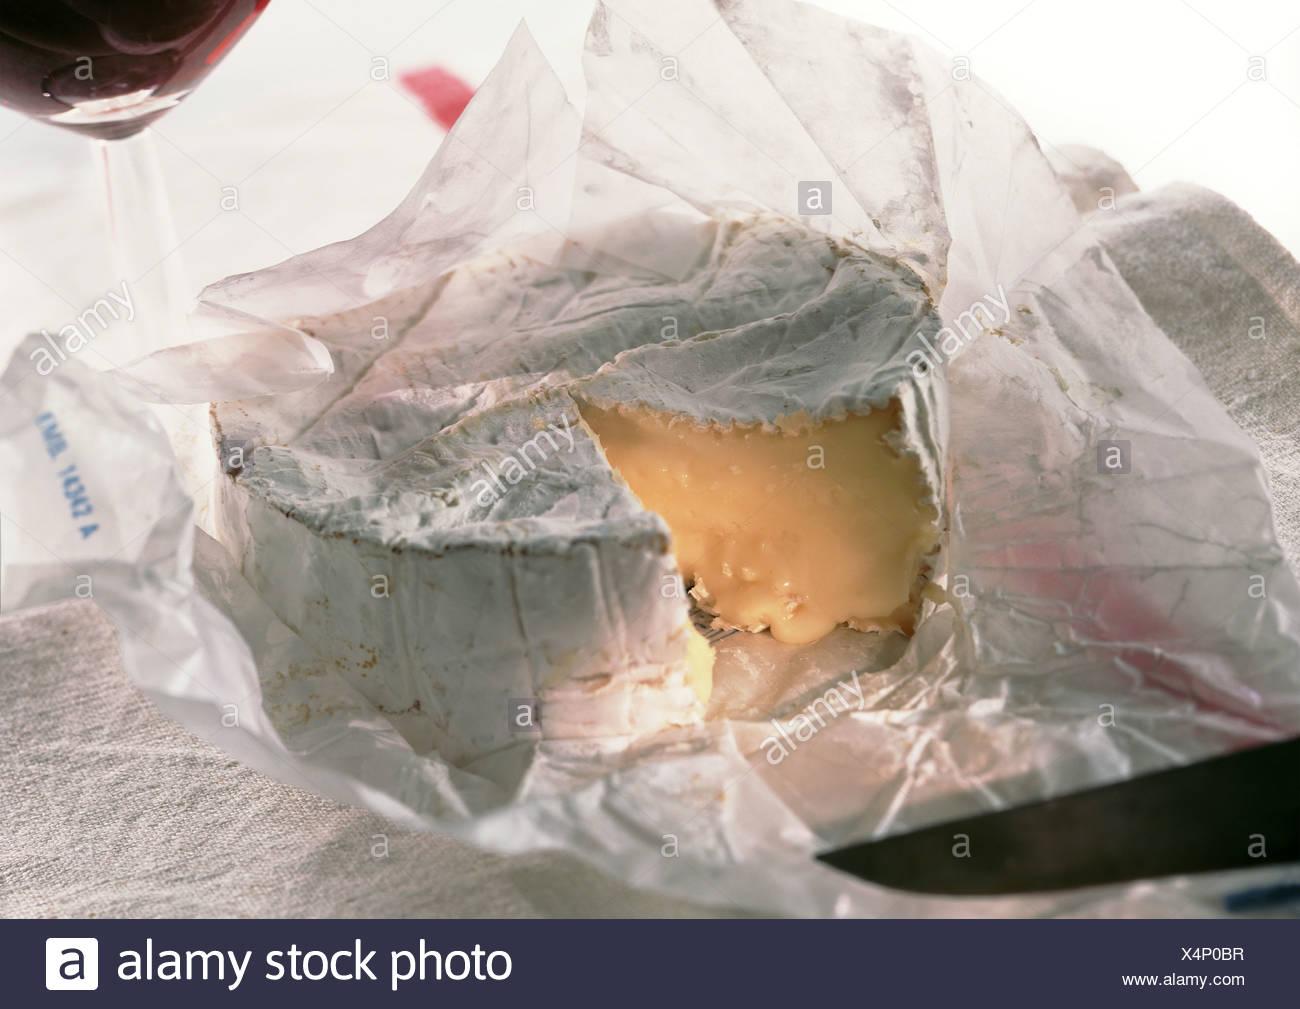 Cut camembert cheese, close-up - Stock Image